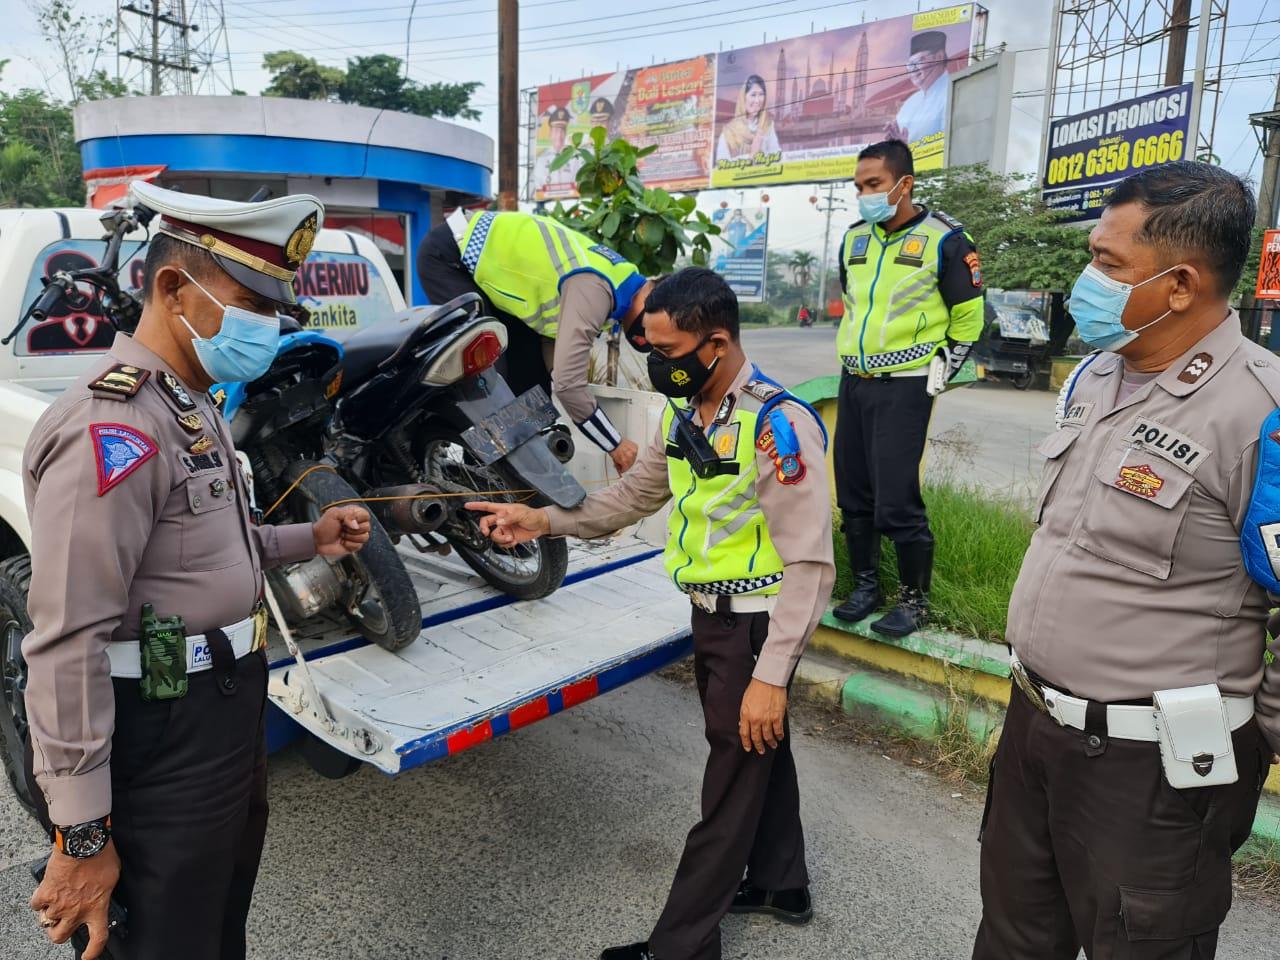 Hari ke 5 Ramadan, Polres Sergai Kembali Amankan Puluhan Kendaraan di Asmara Subuh